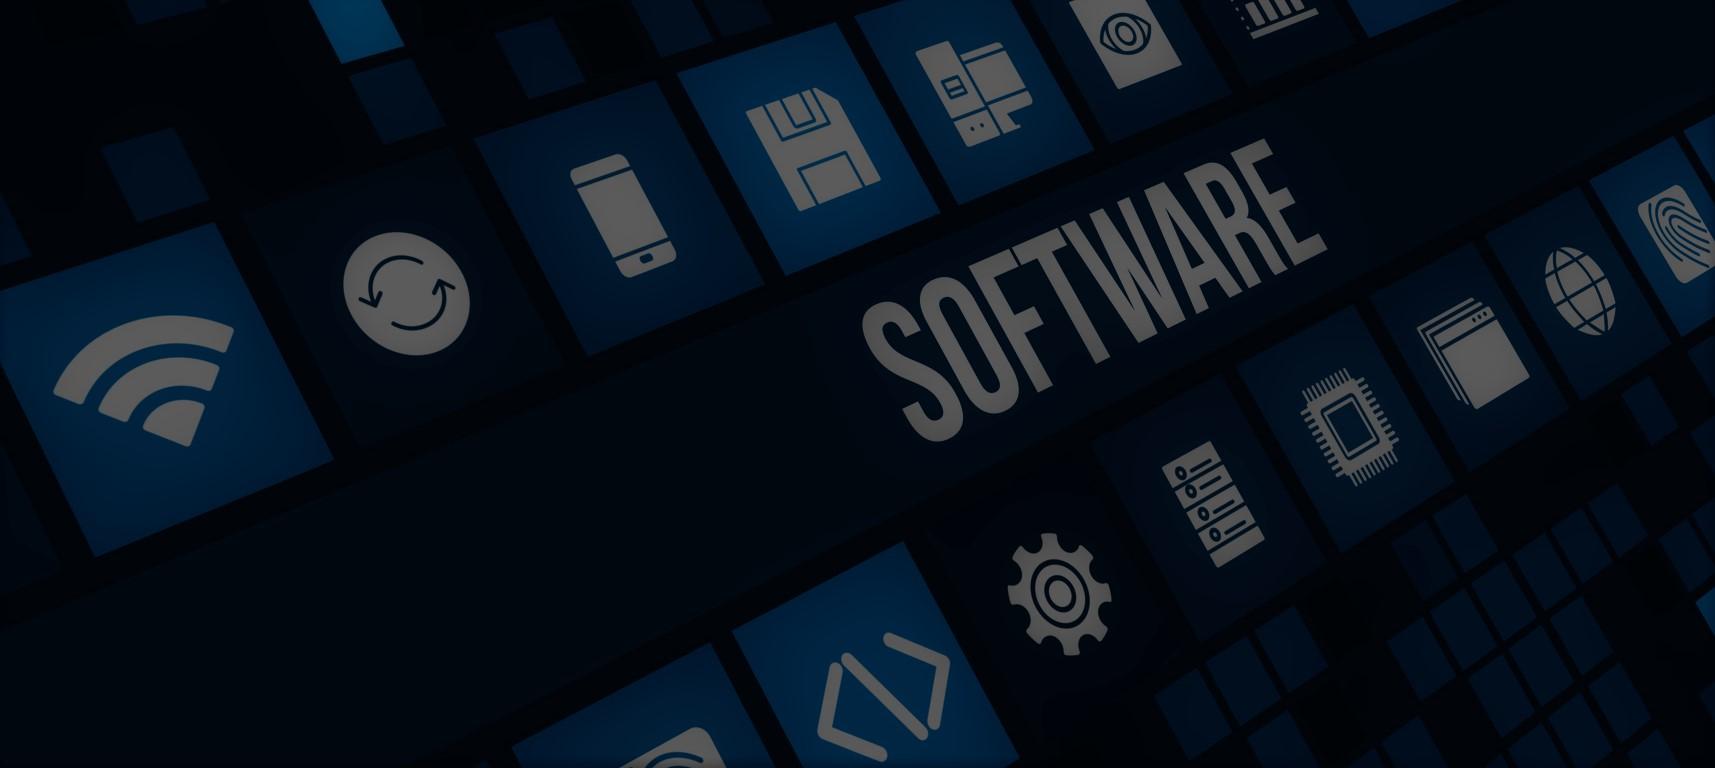 D-Systeme - Software-Entwicklung